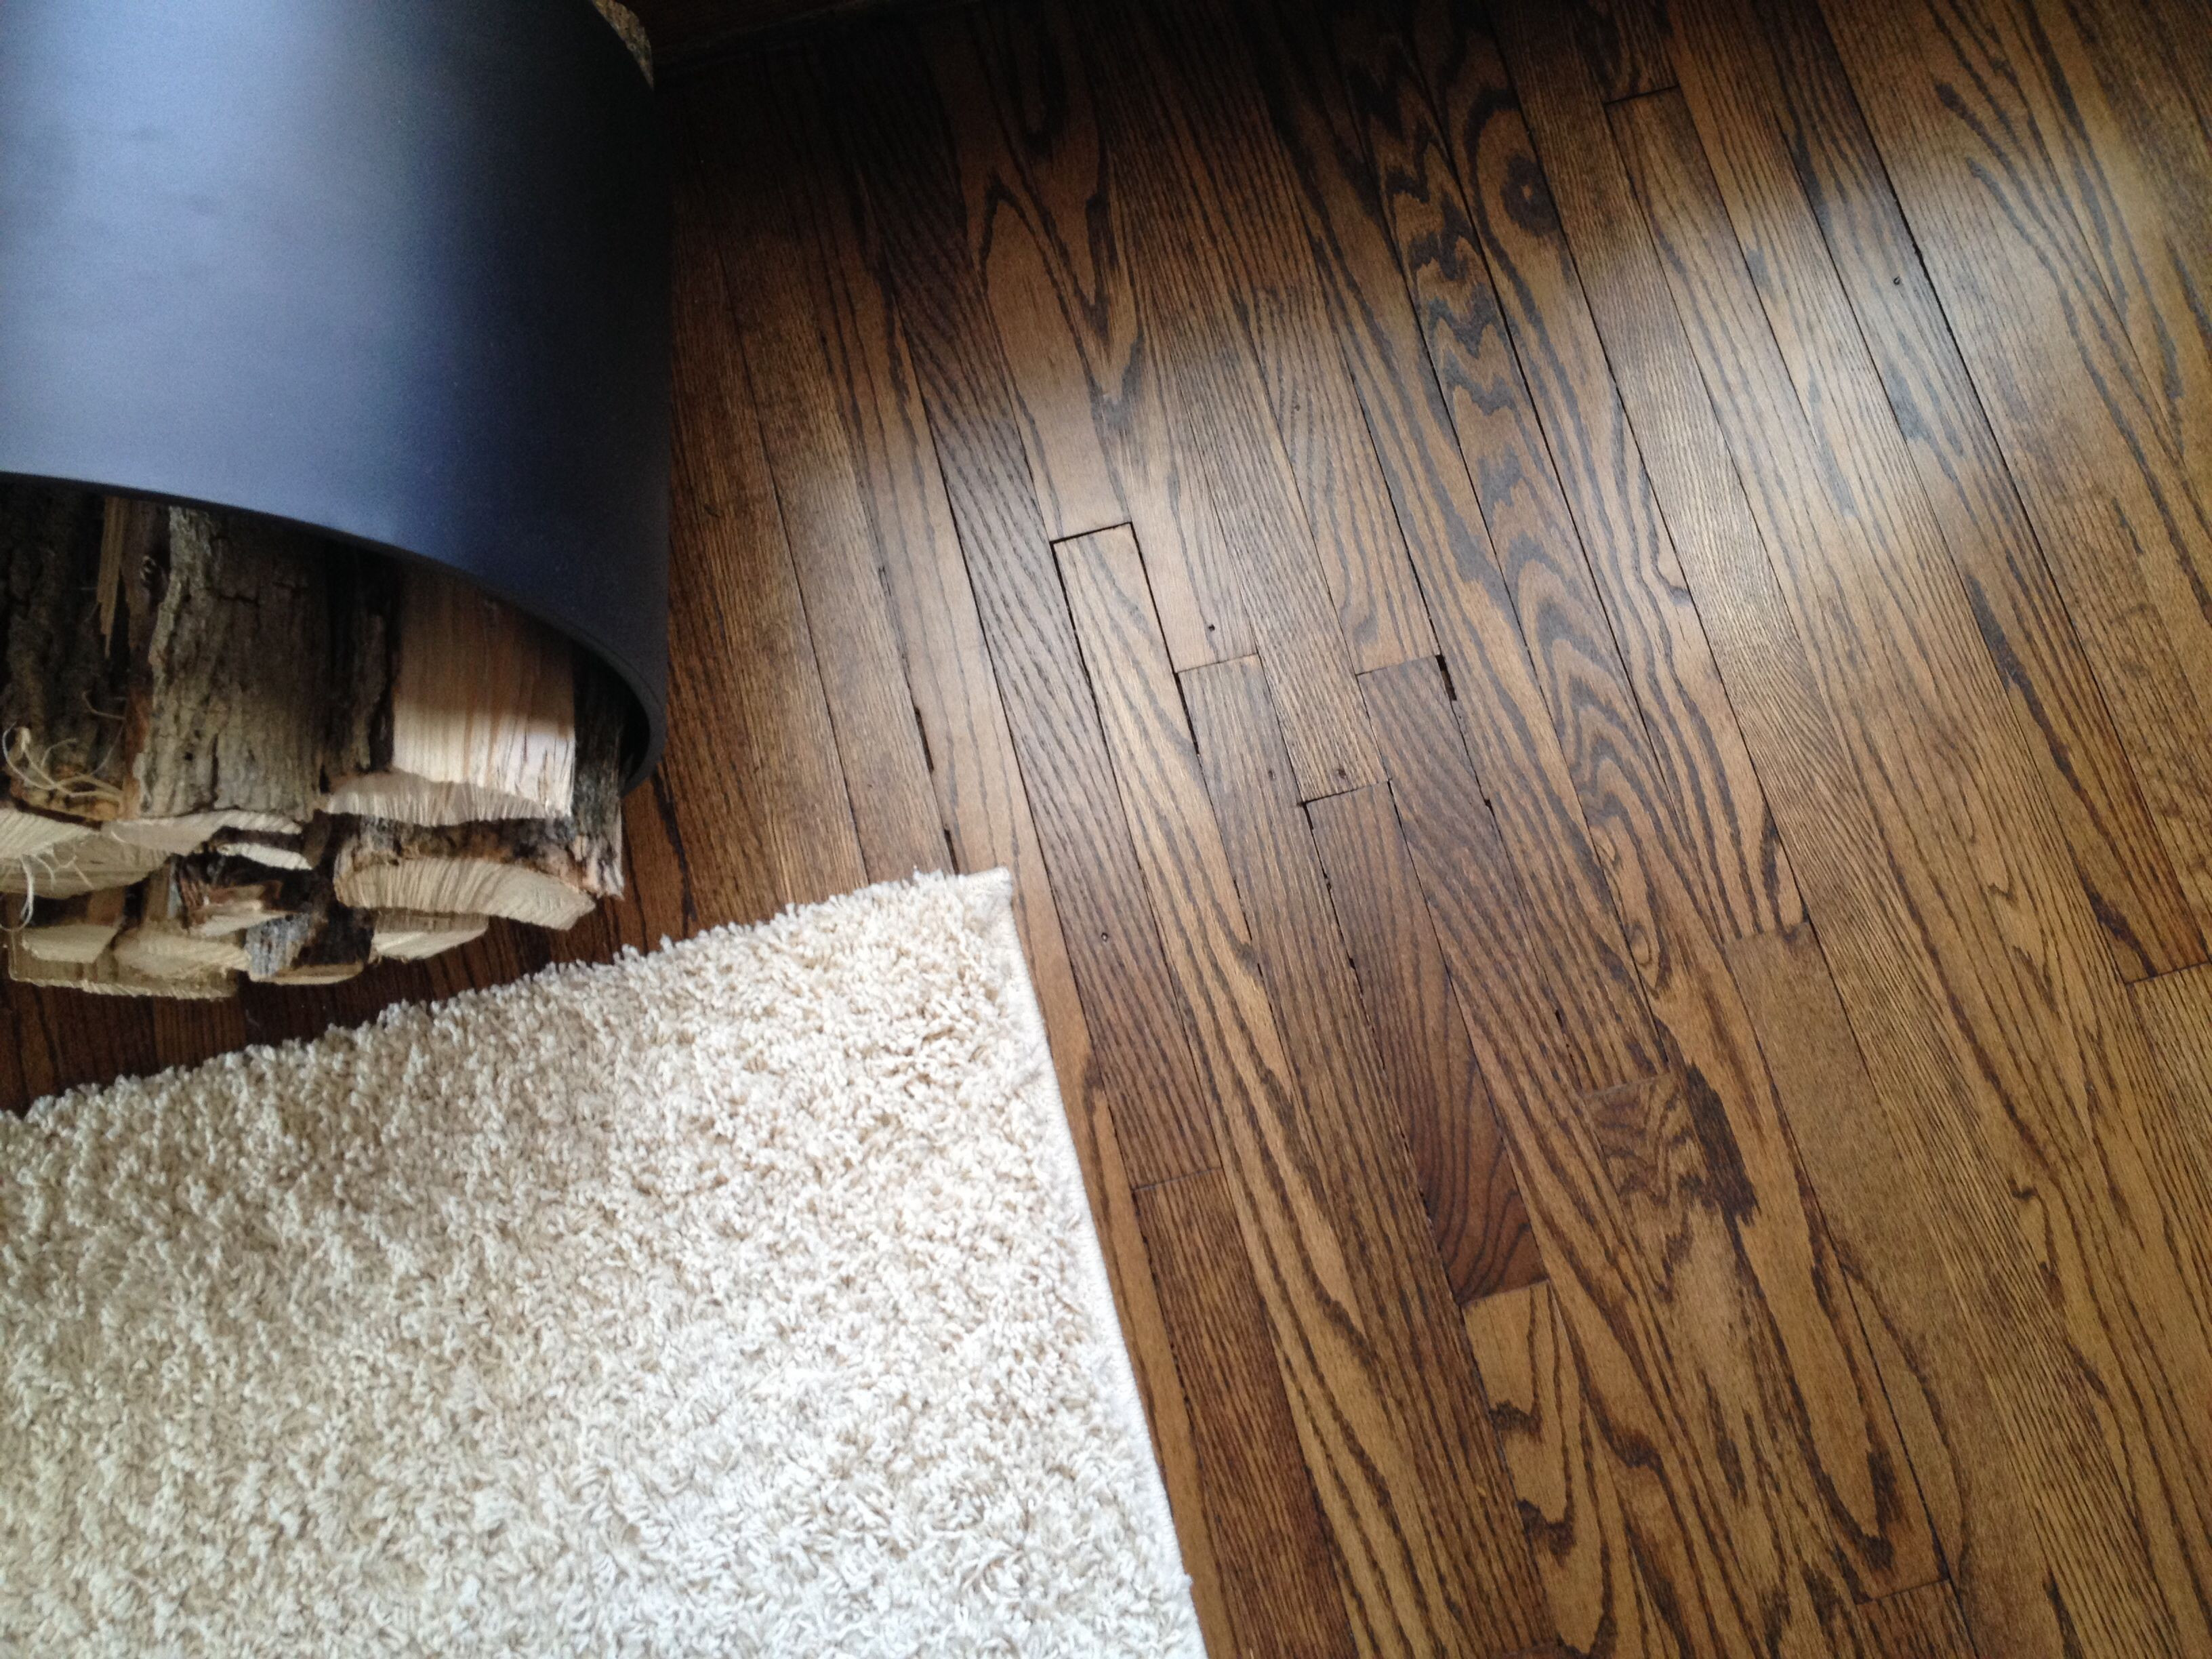 homerwood hardwood flooring prices of 18 fresh oak hardwood floors pictures dizpos com with regard to oak hardwood floors unique 113 year old original oak floors refinished in espresso stain images of